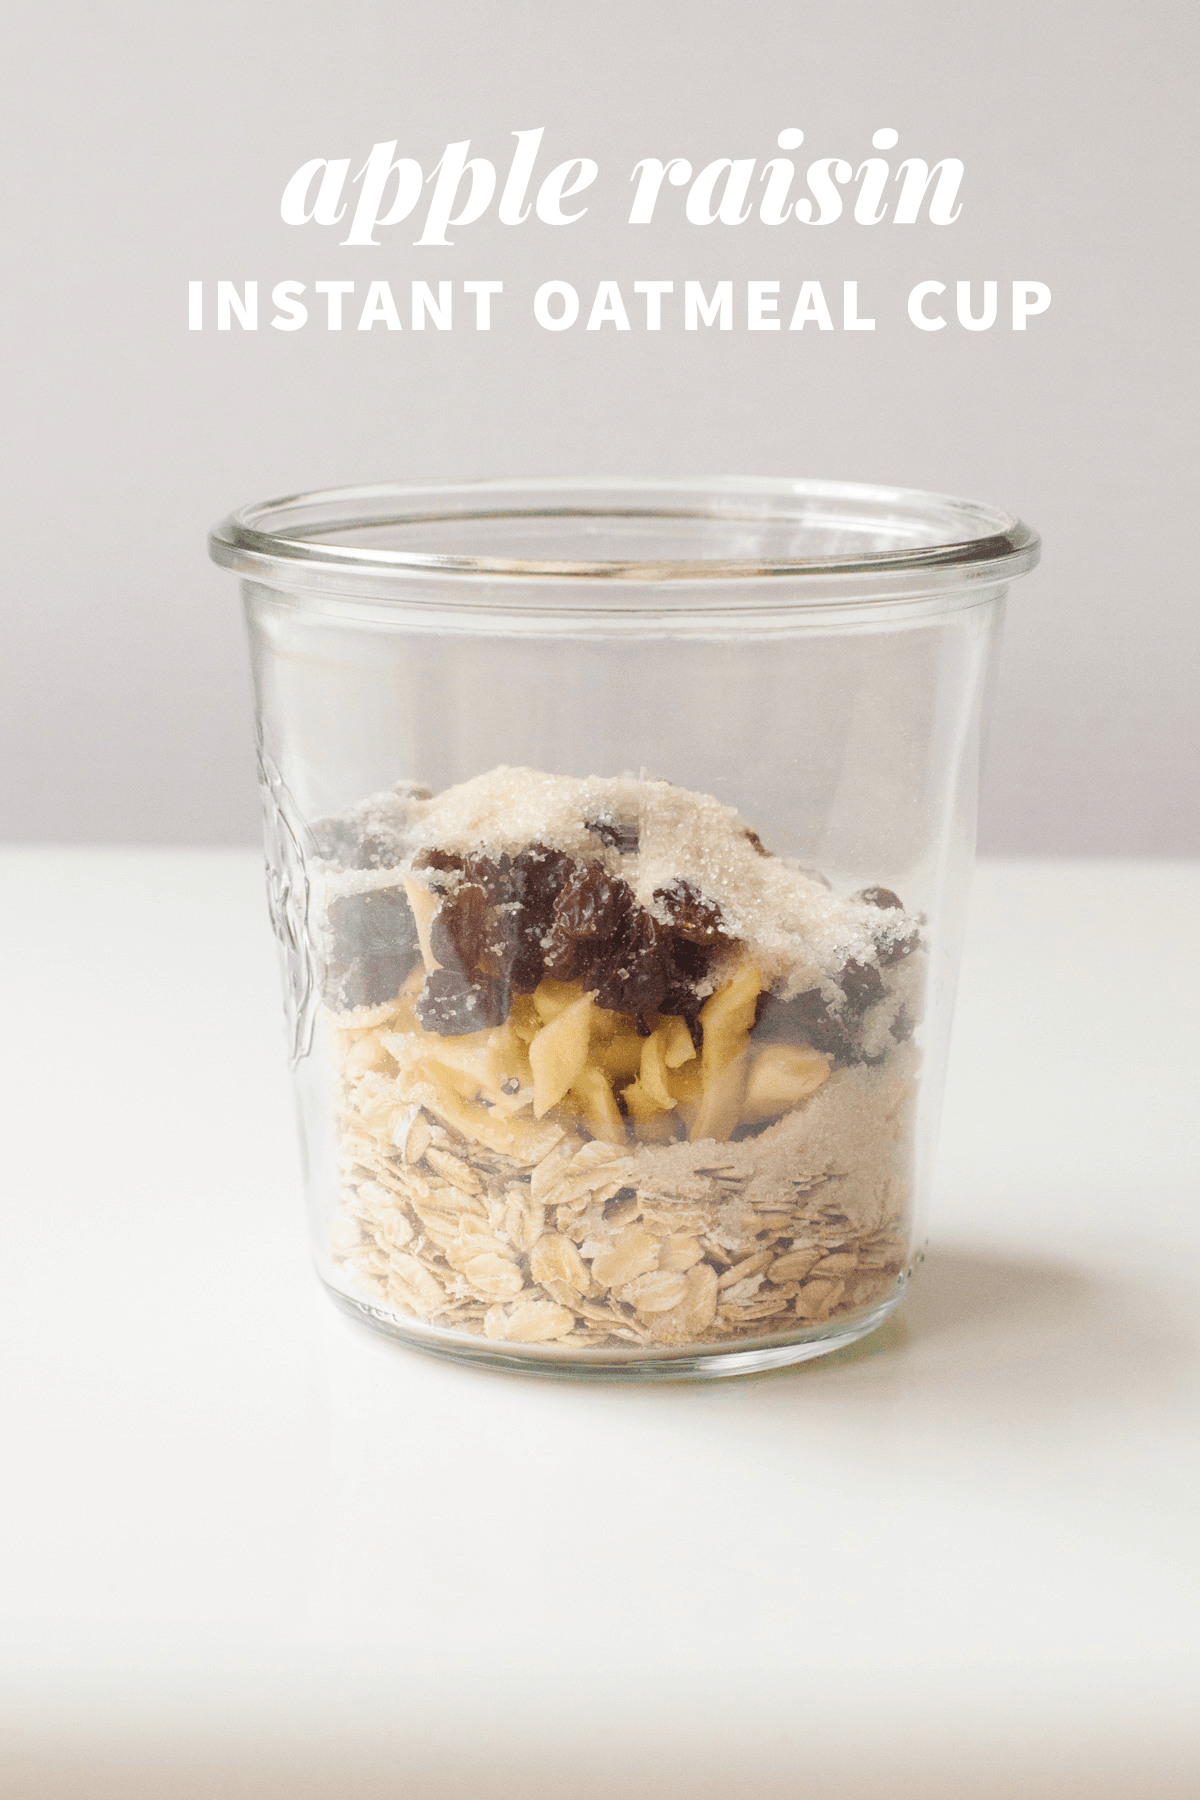 Healthy Instant Oatmeal Cups—Apple Raisin